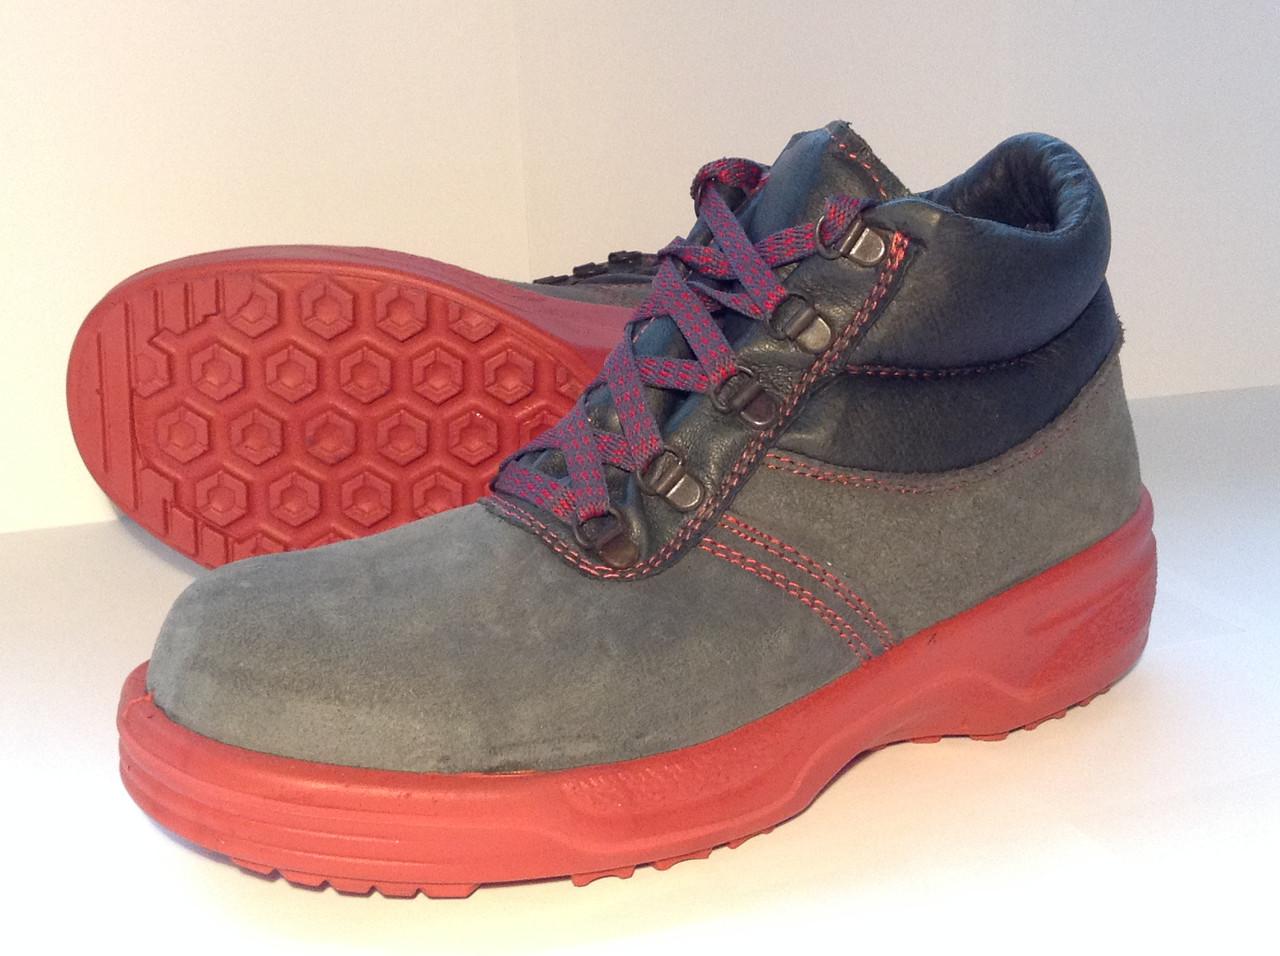 Ботинки Wurth серые без защиты носка на красной подошве